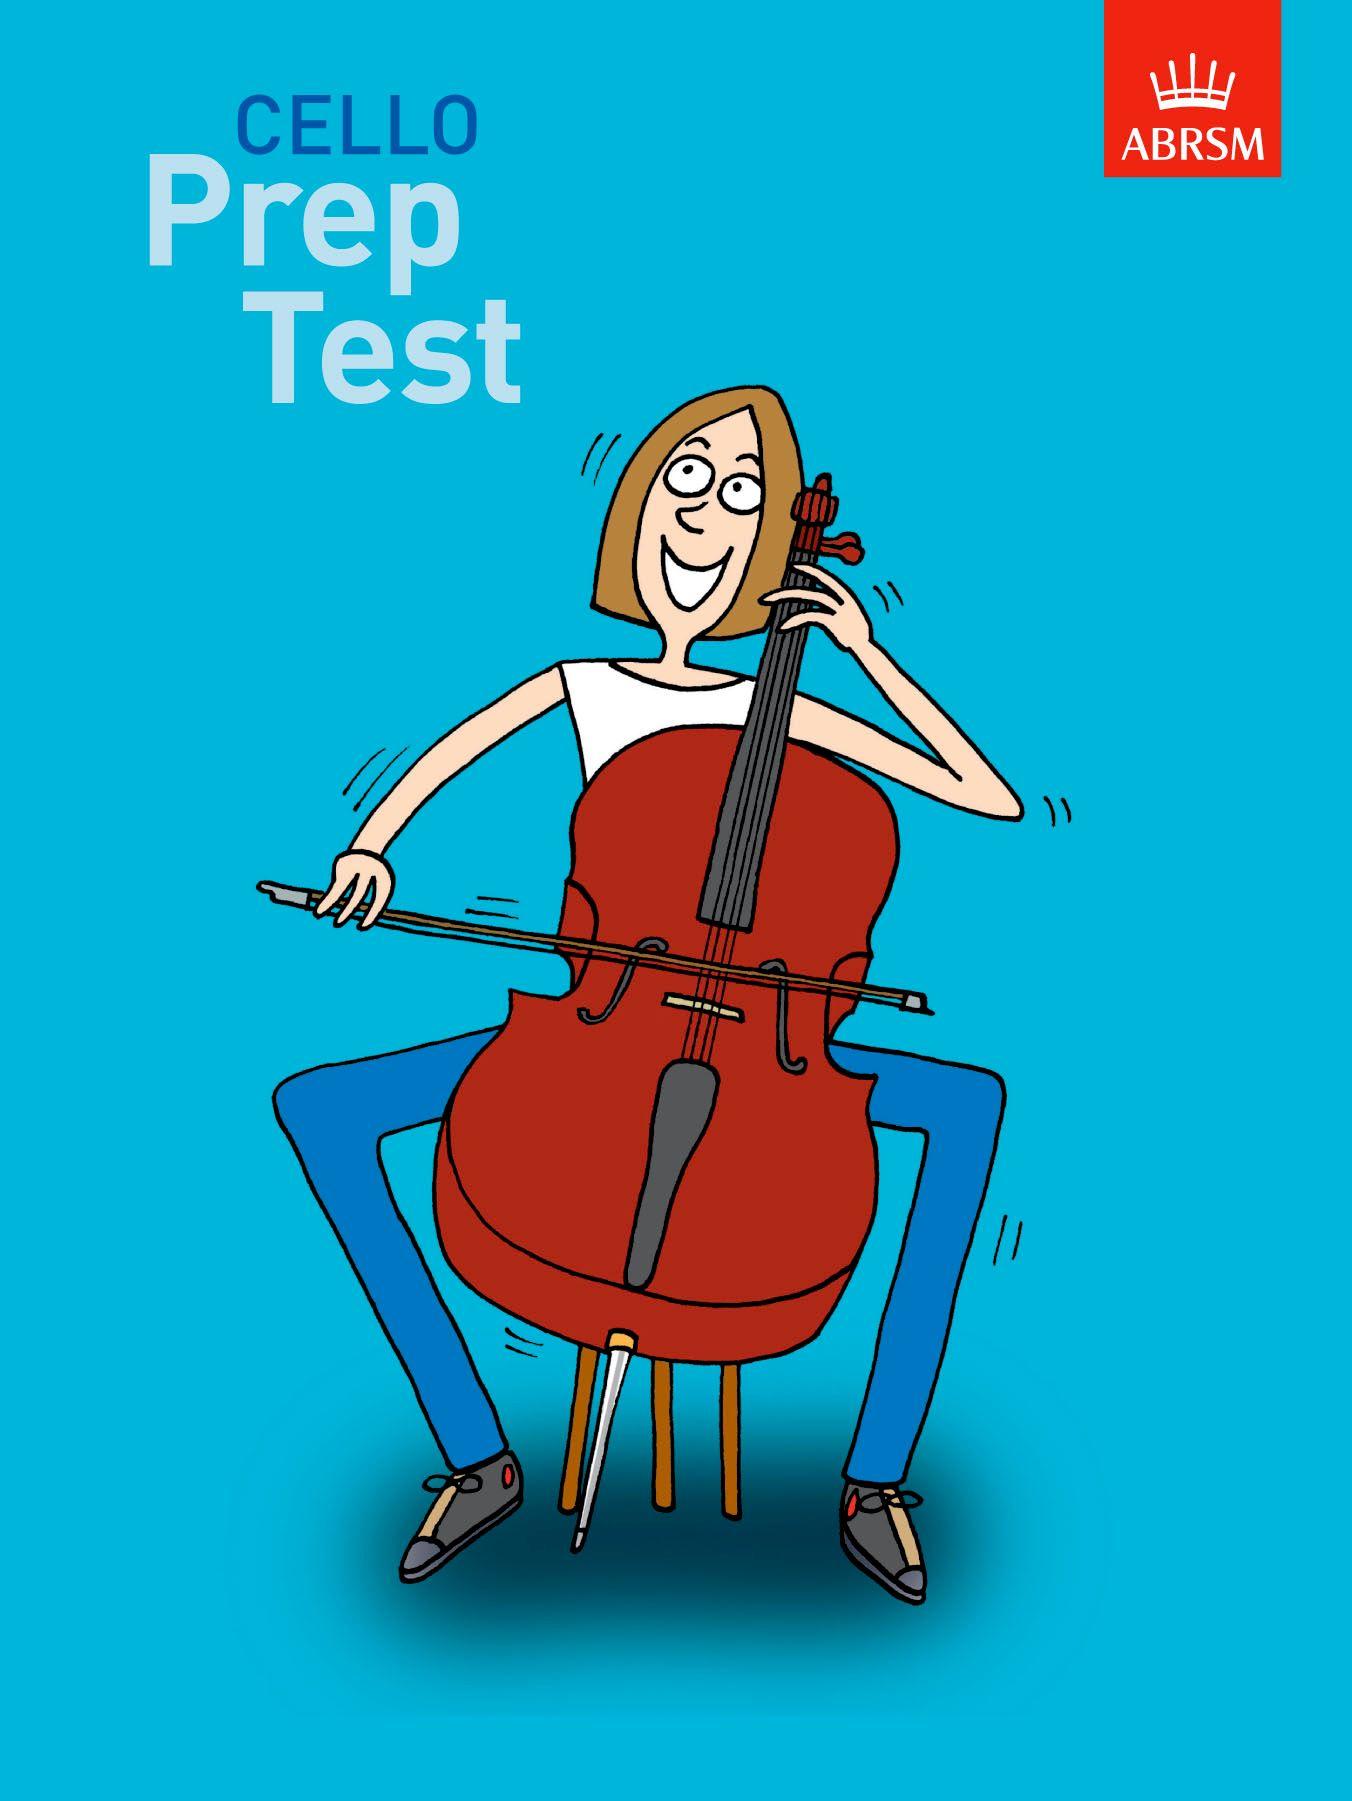 ABRSM Cello Prep Test